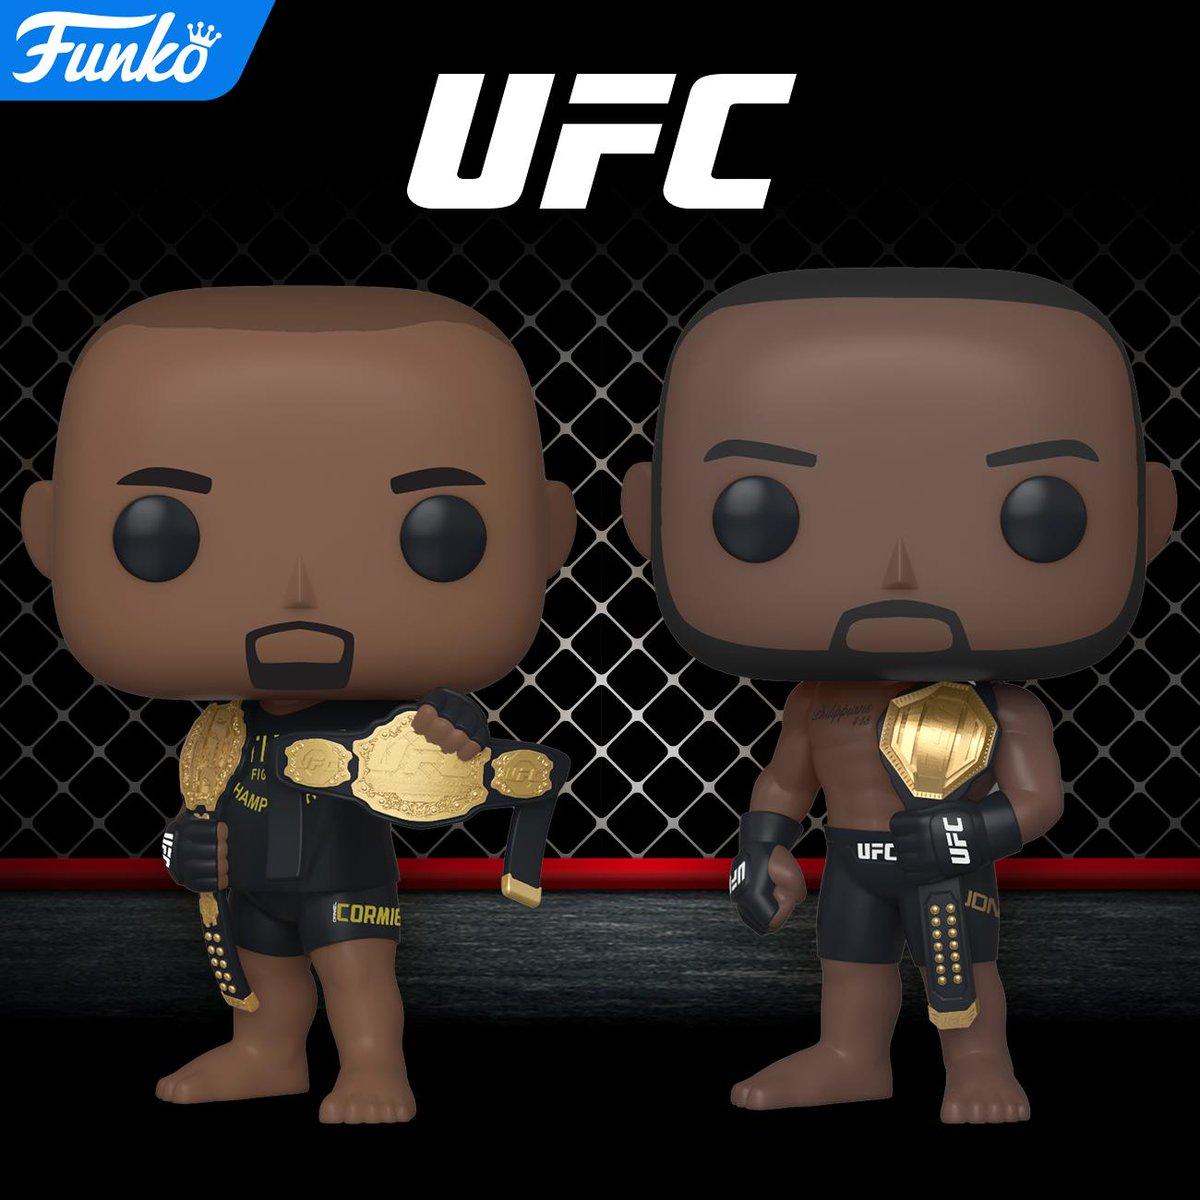 Coming Soon: Pop! UFC! funko.com/blog/article/c… @ufc #Funko #Pop #FunkoPop #UFC